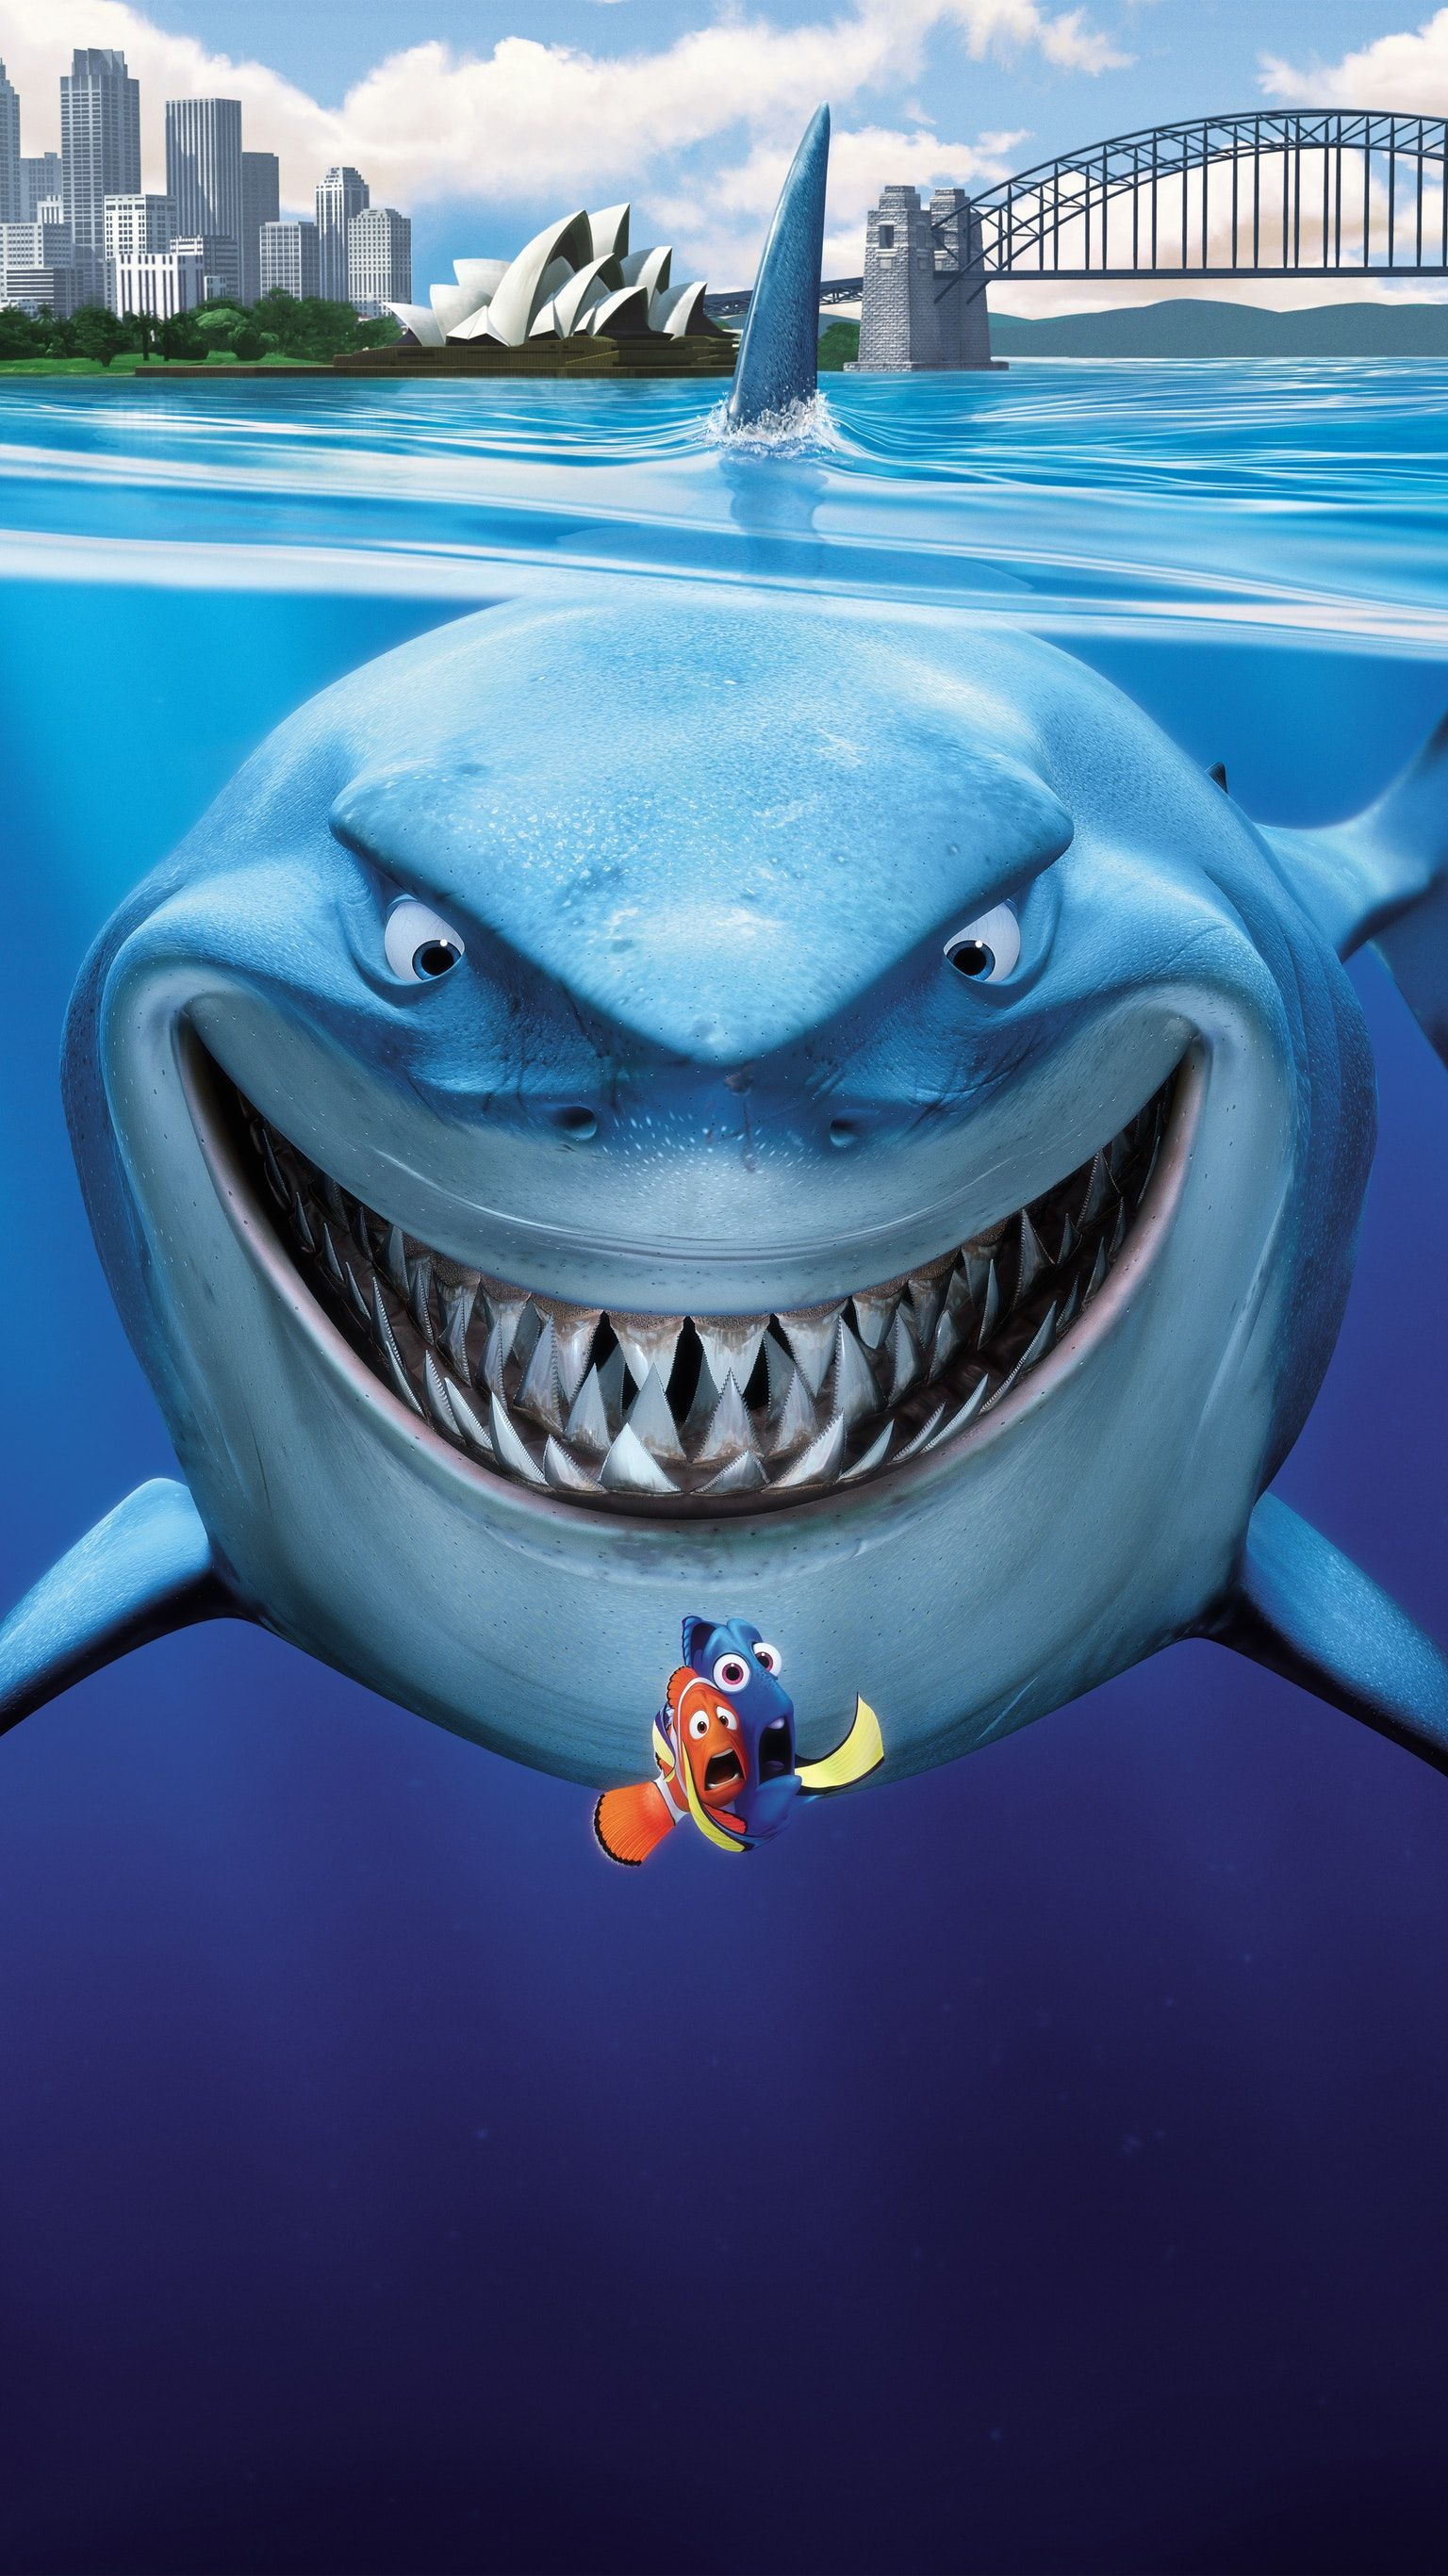 Finding Nemo (2003) Phone Wallpaper in 2020 Finding nemo